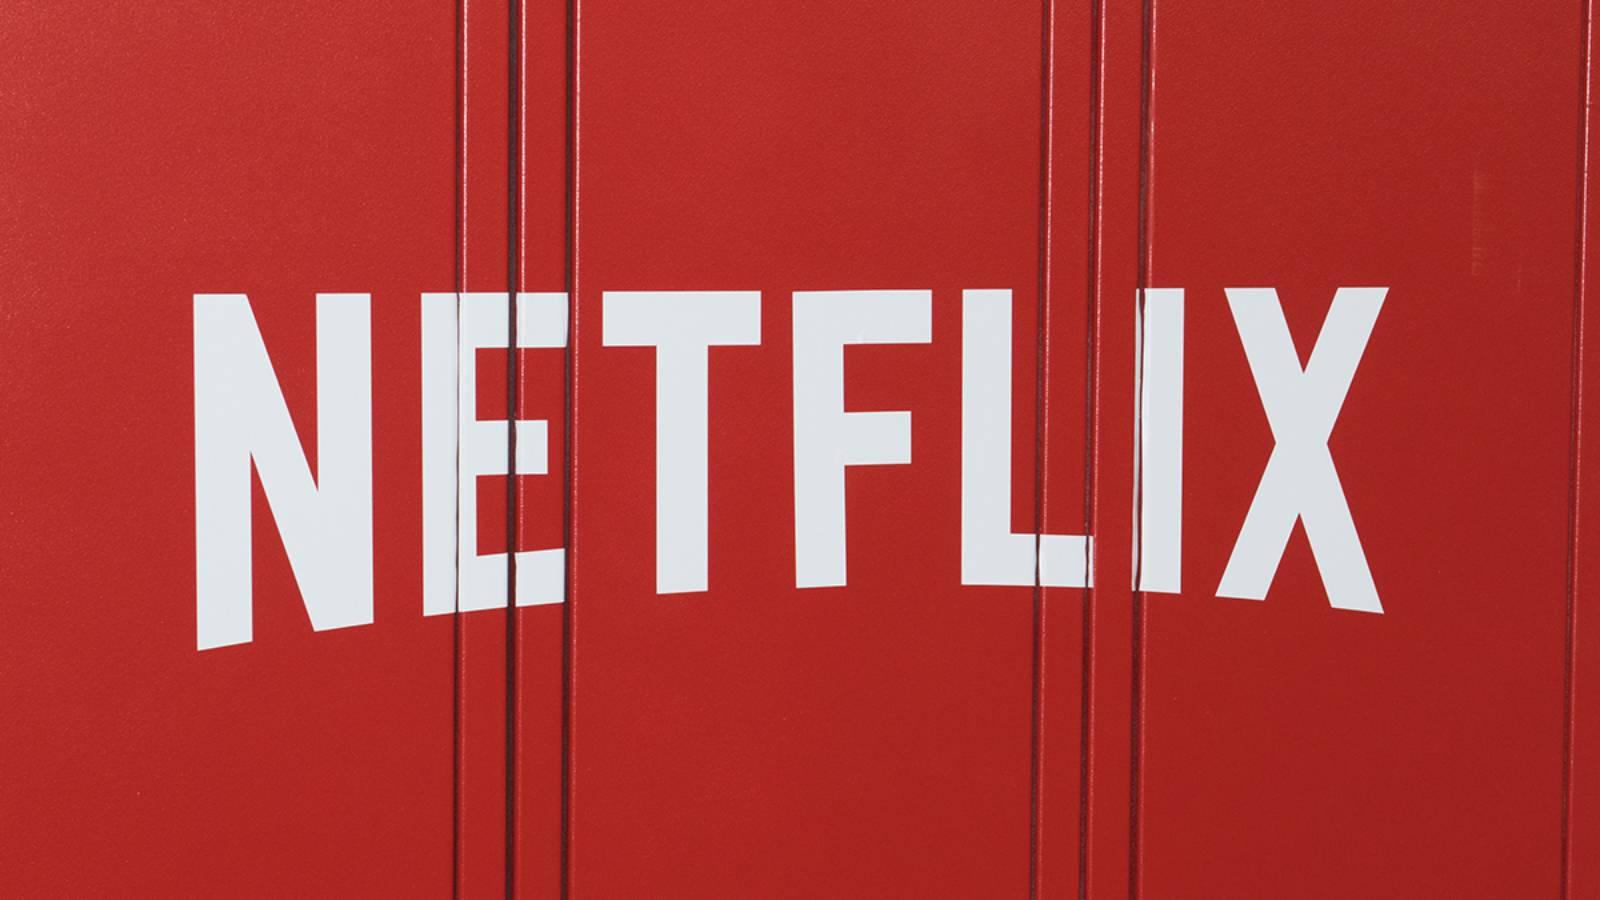 Netflix valoare